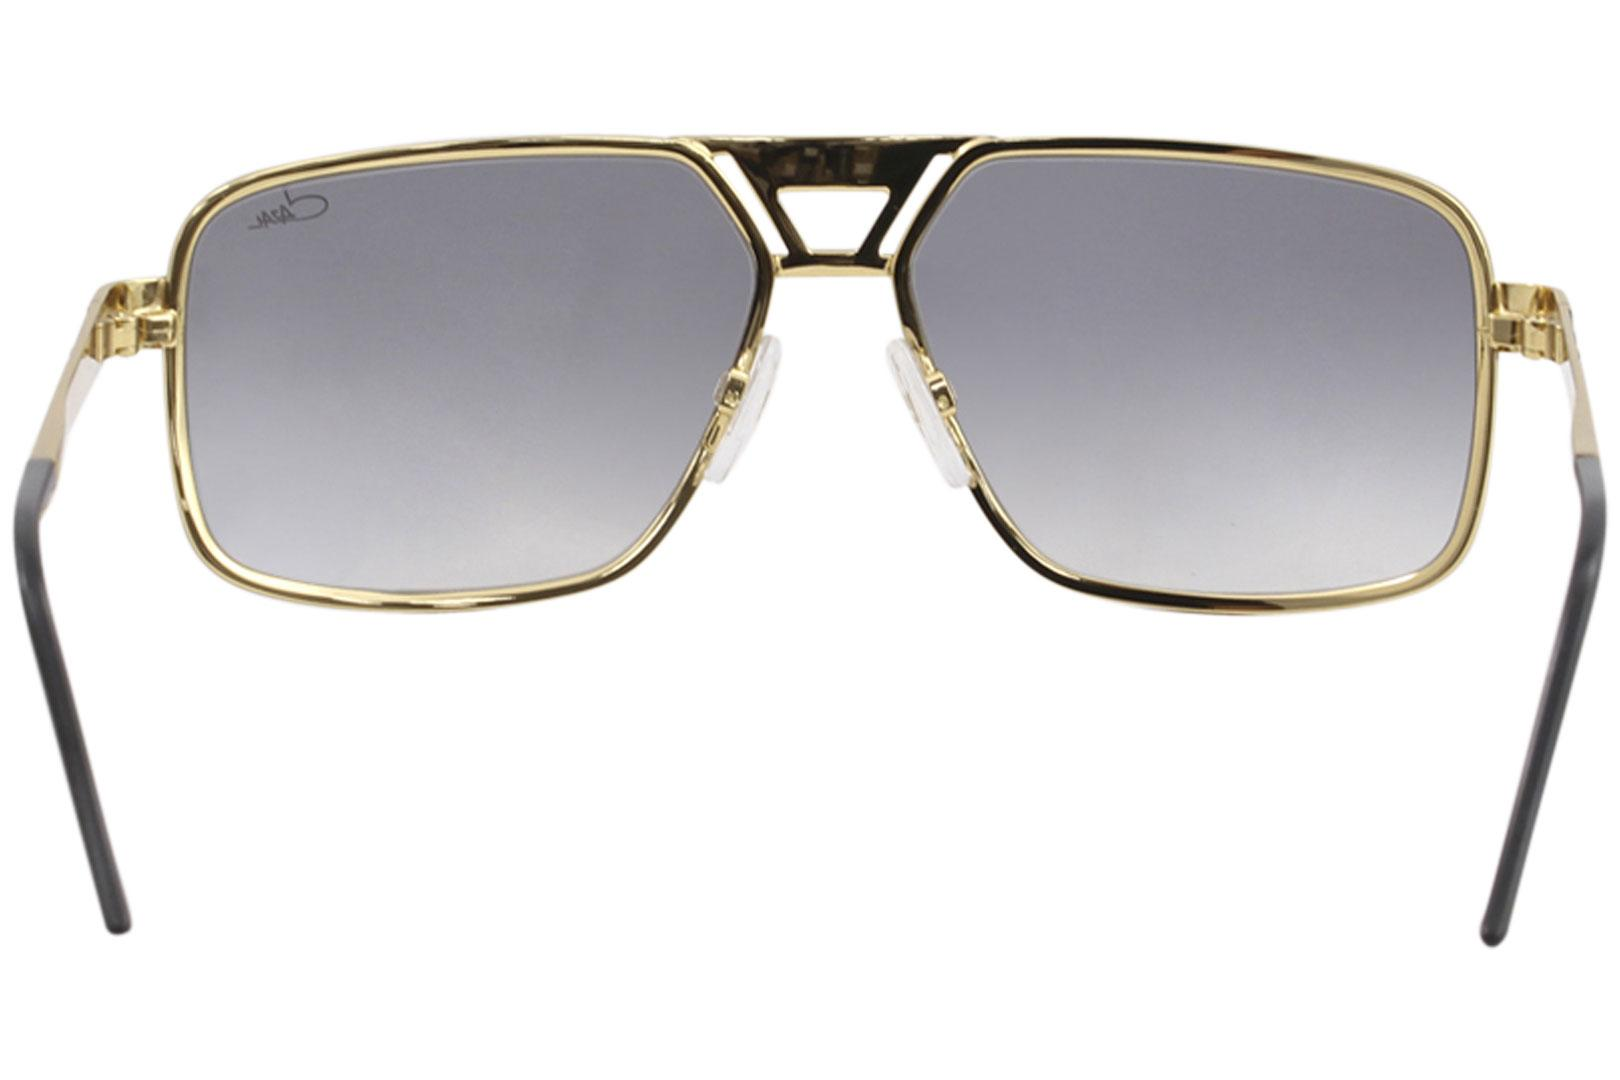 d51c628a4bc Cazal Men s 9071 Retro Pilot Sunglasses by Cazal